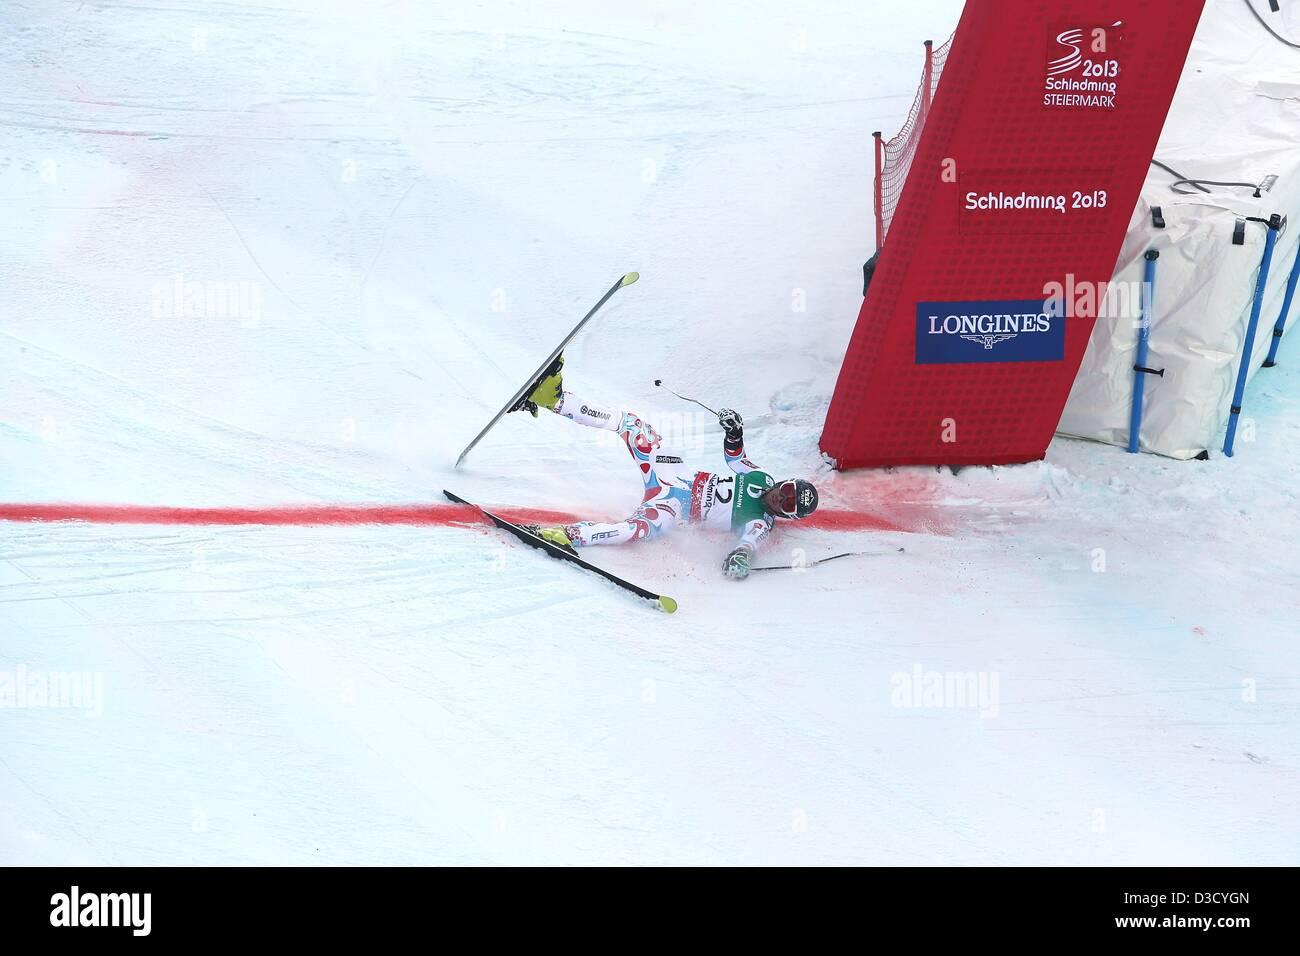 15.02.2013. Schladming, Austria. FIS Alpine Ski World Championships 2013 Giant slalom for men Picture shows Thomas Stock Photo